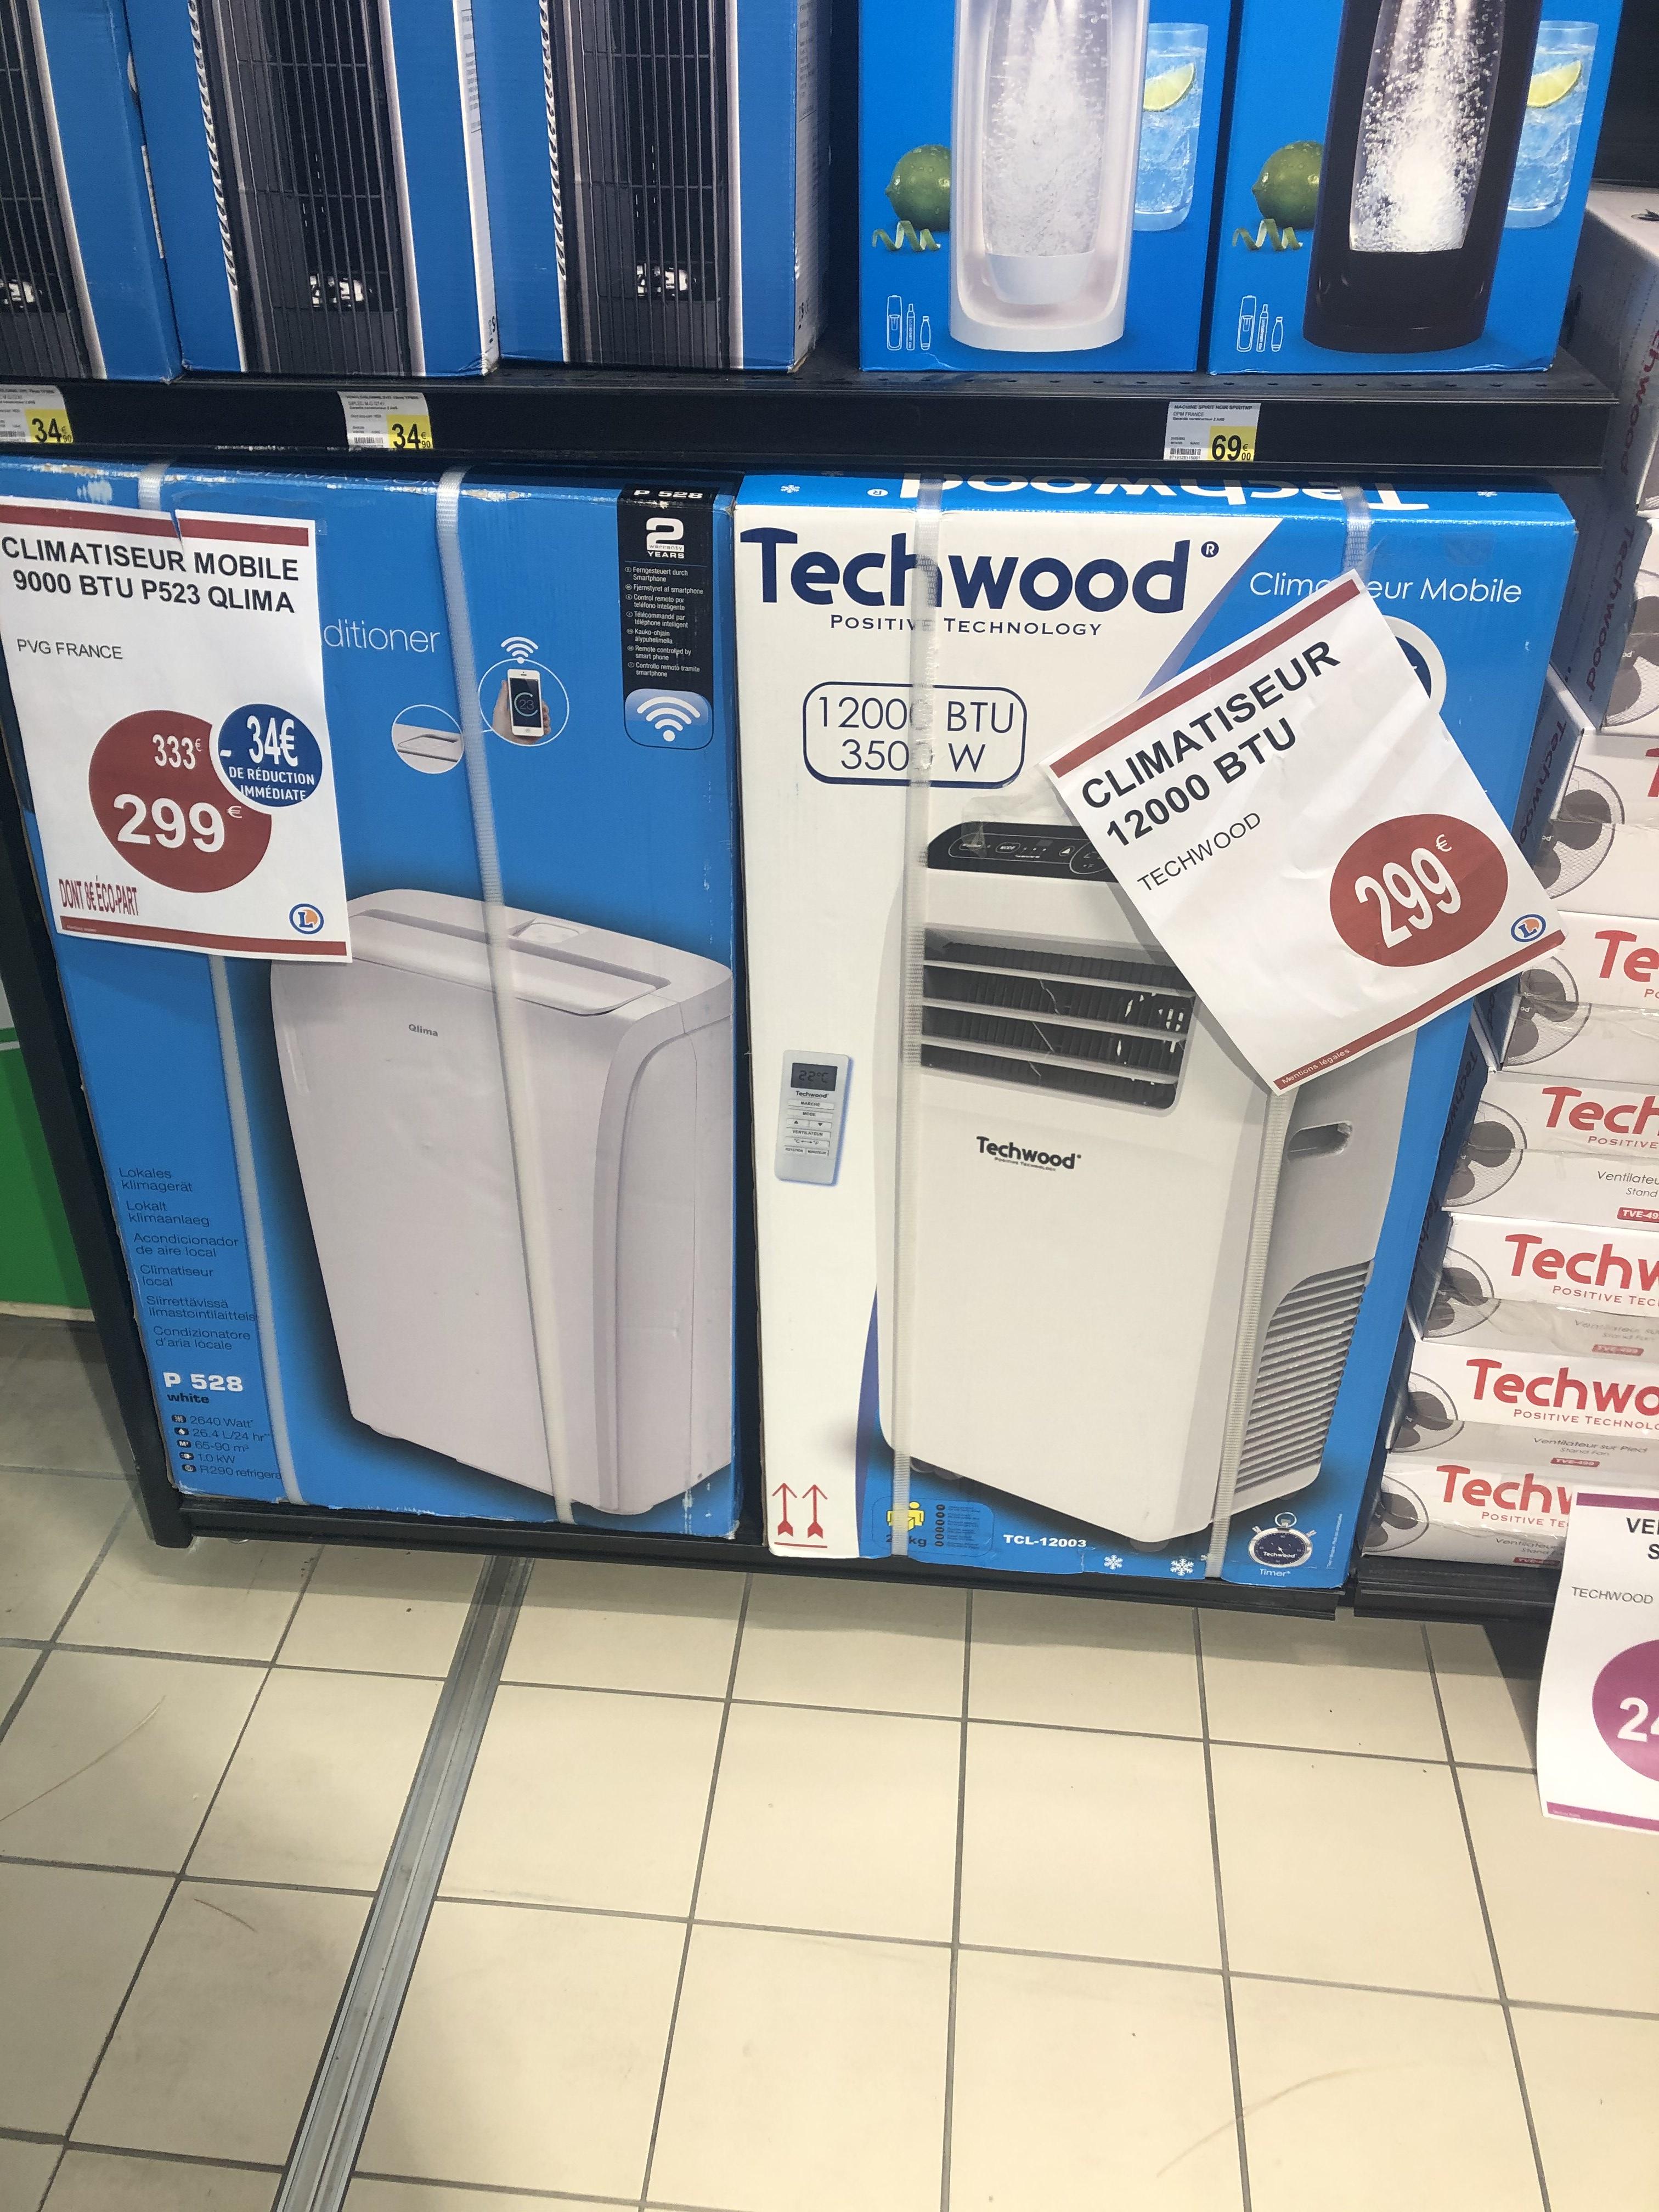 Climatiseur mobile Techwood - 12000 BTU, 3500W - Pantin (93)